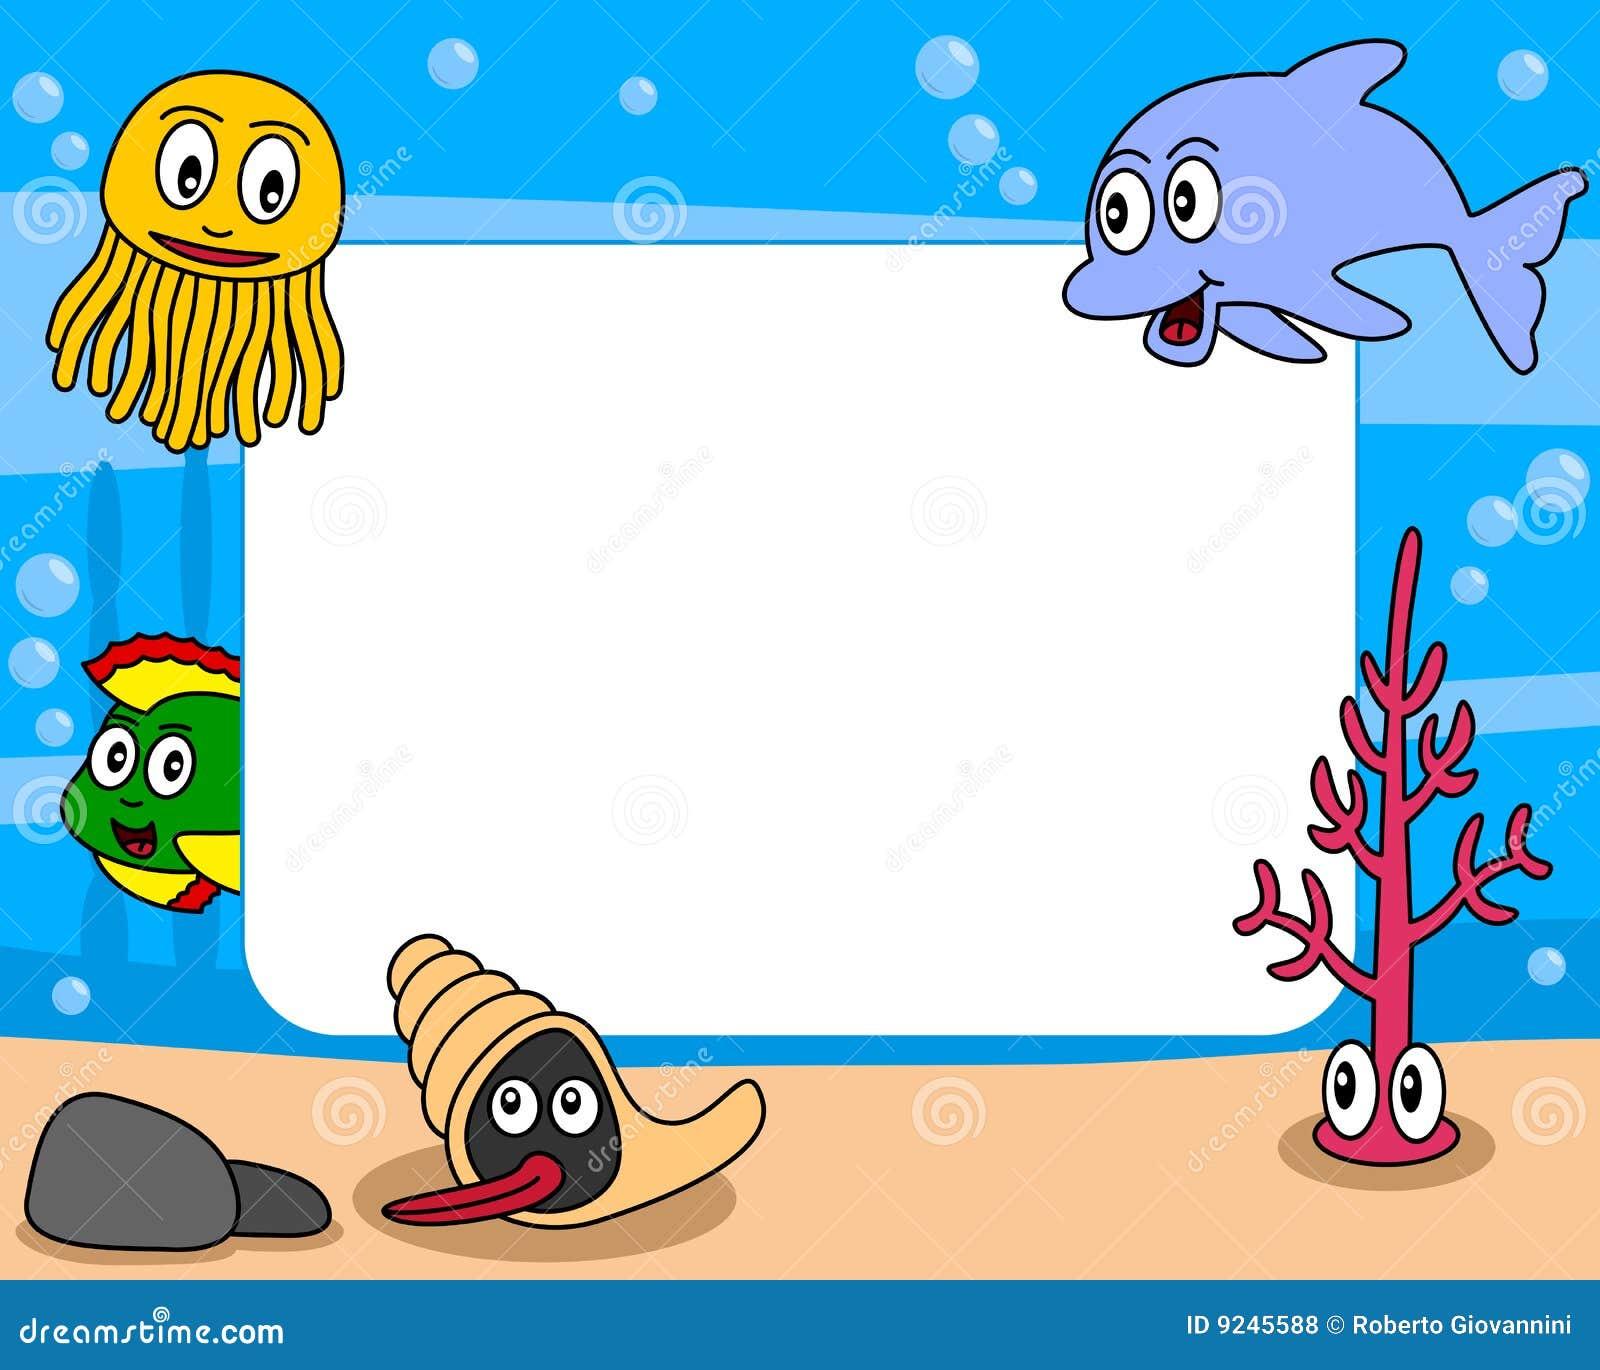 sea life photo frame  1  stock vector illustration of seaweed vector free download seaweed illustration vector